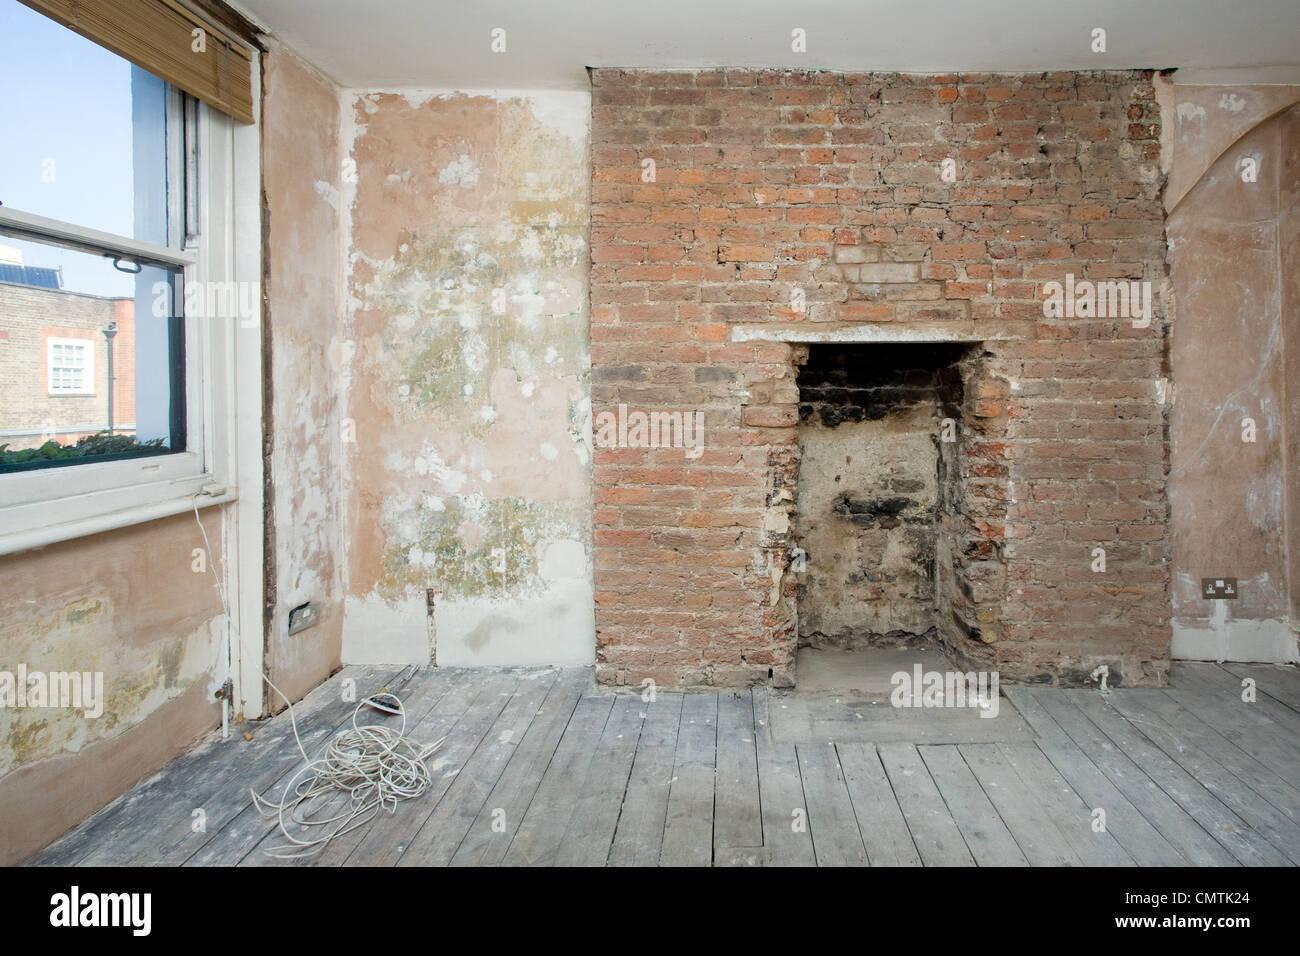 Renovate Brick Fireplace Room Undergoing Renovation With Brick Fireplace Stock Photo